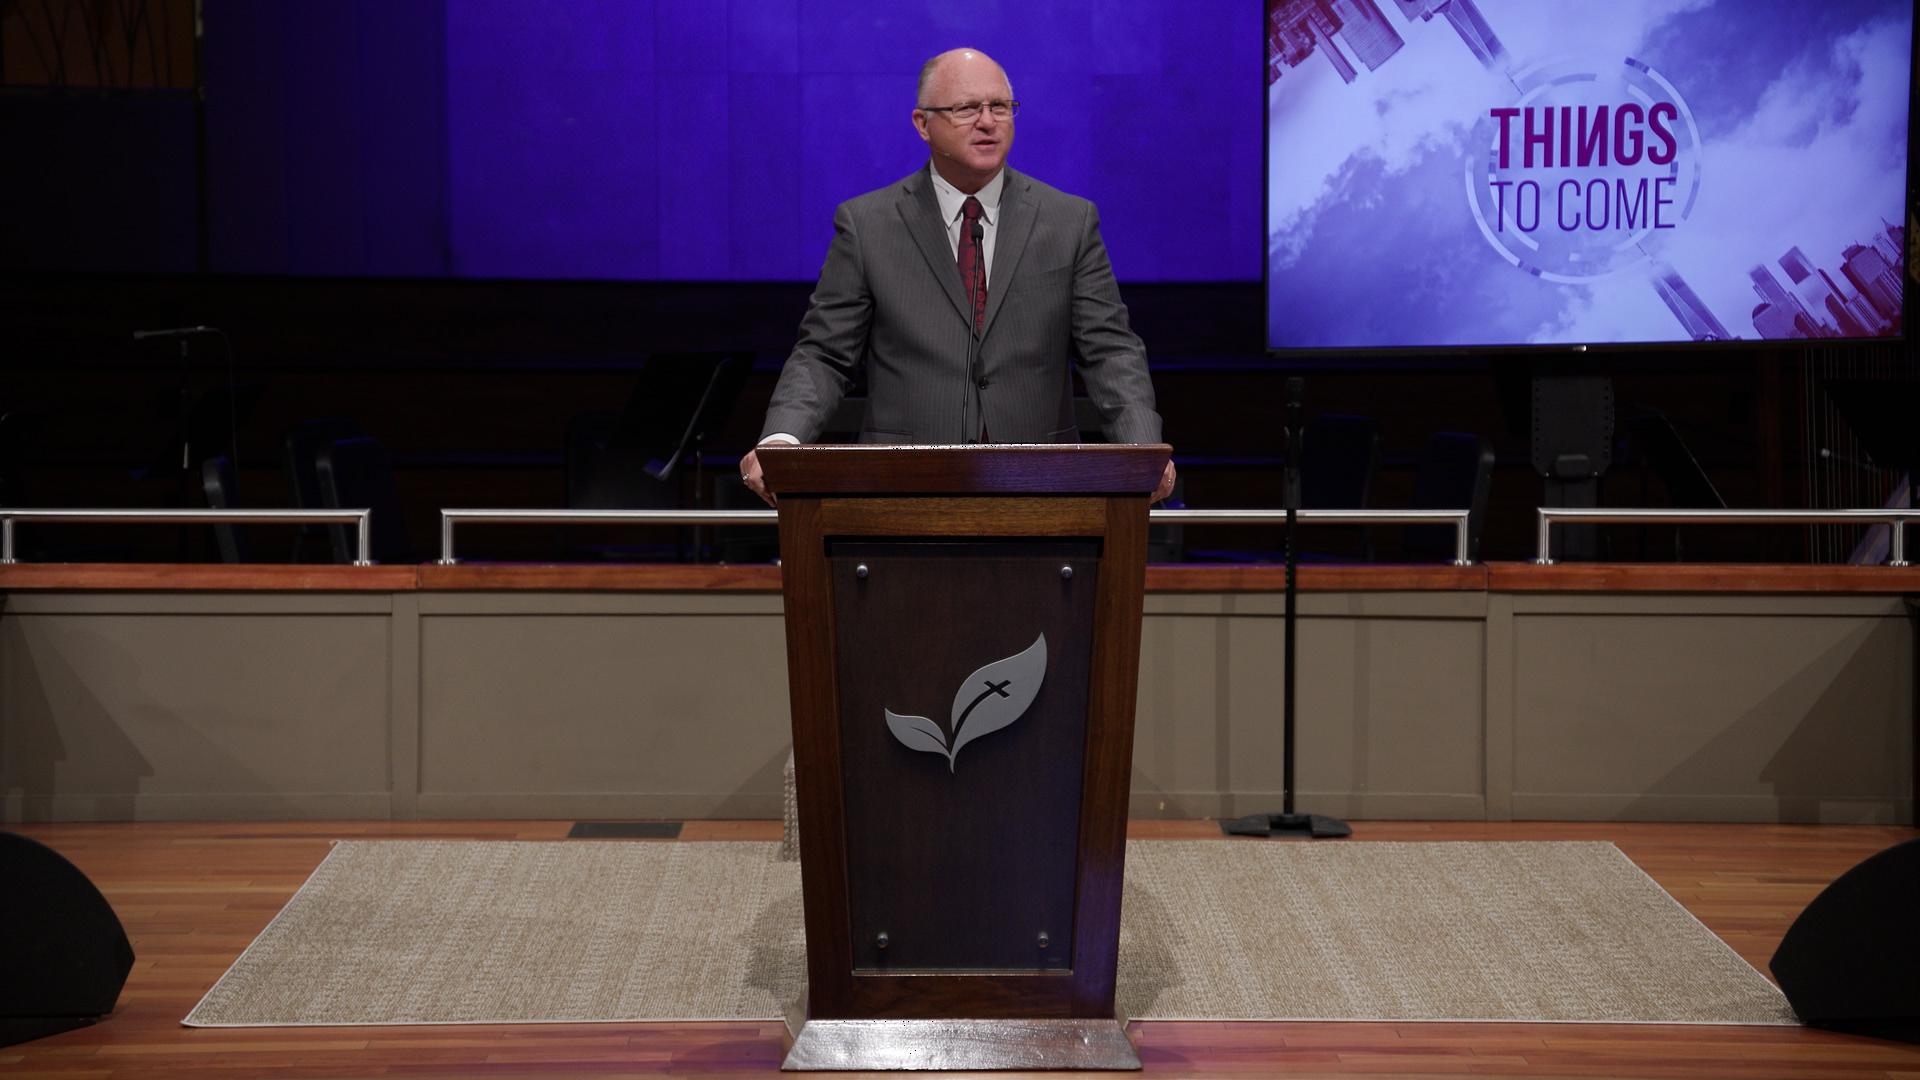 Pastor Paul Chappell: The One World Ruler